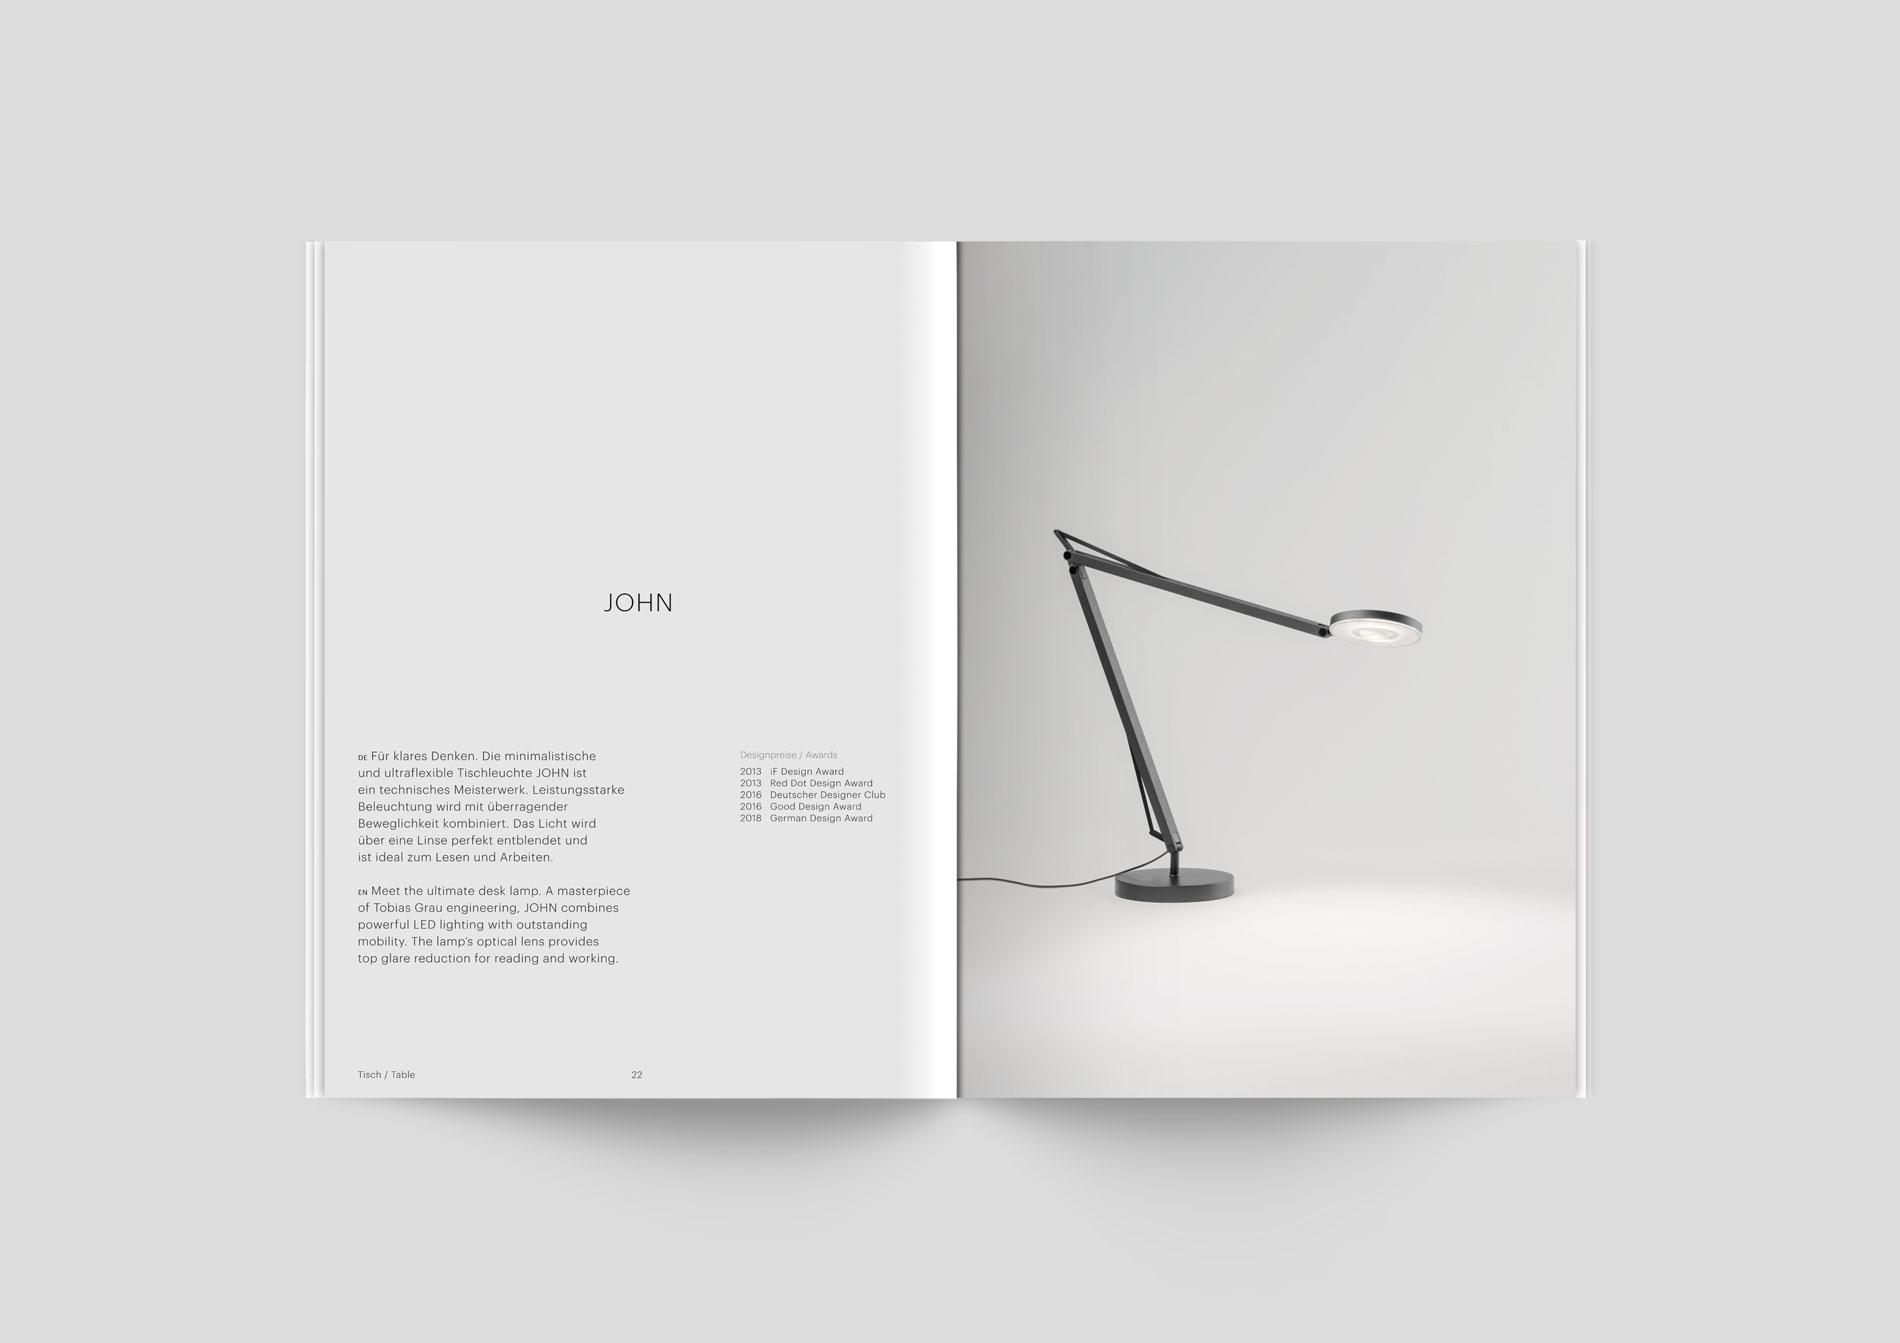 nicoletta-dalfino-tobias-grau-catalogue-2019-john